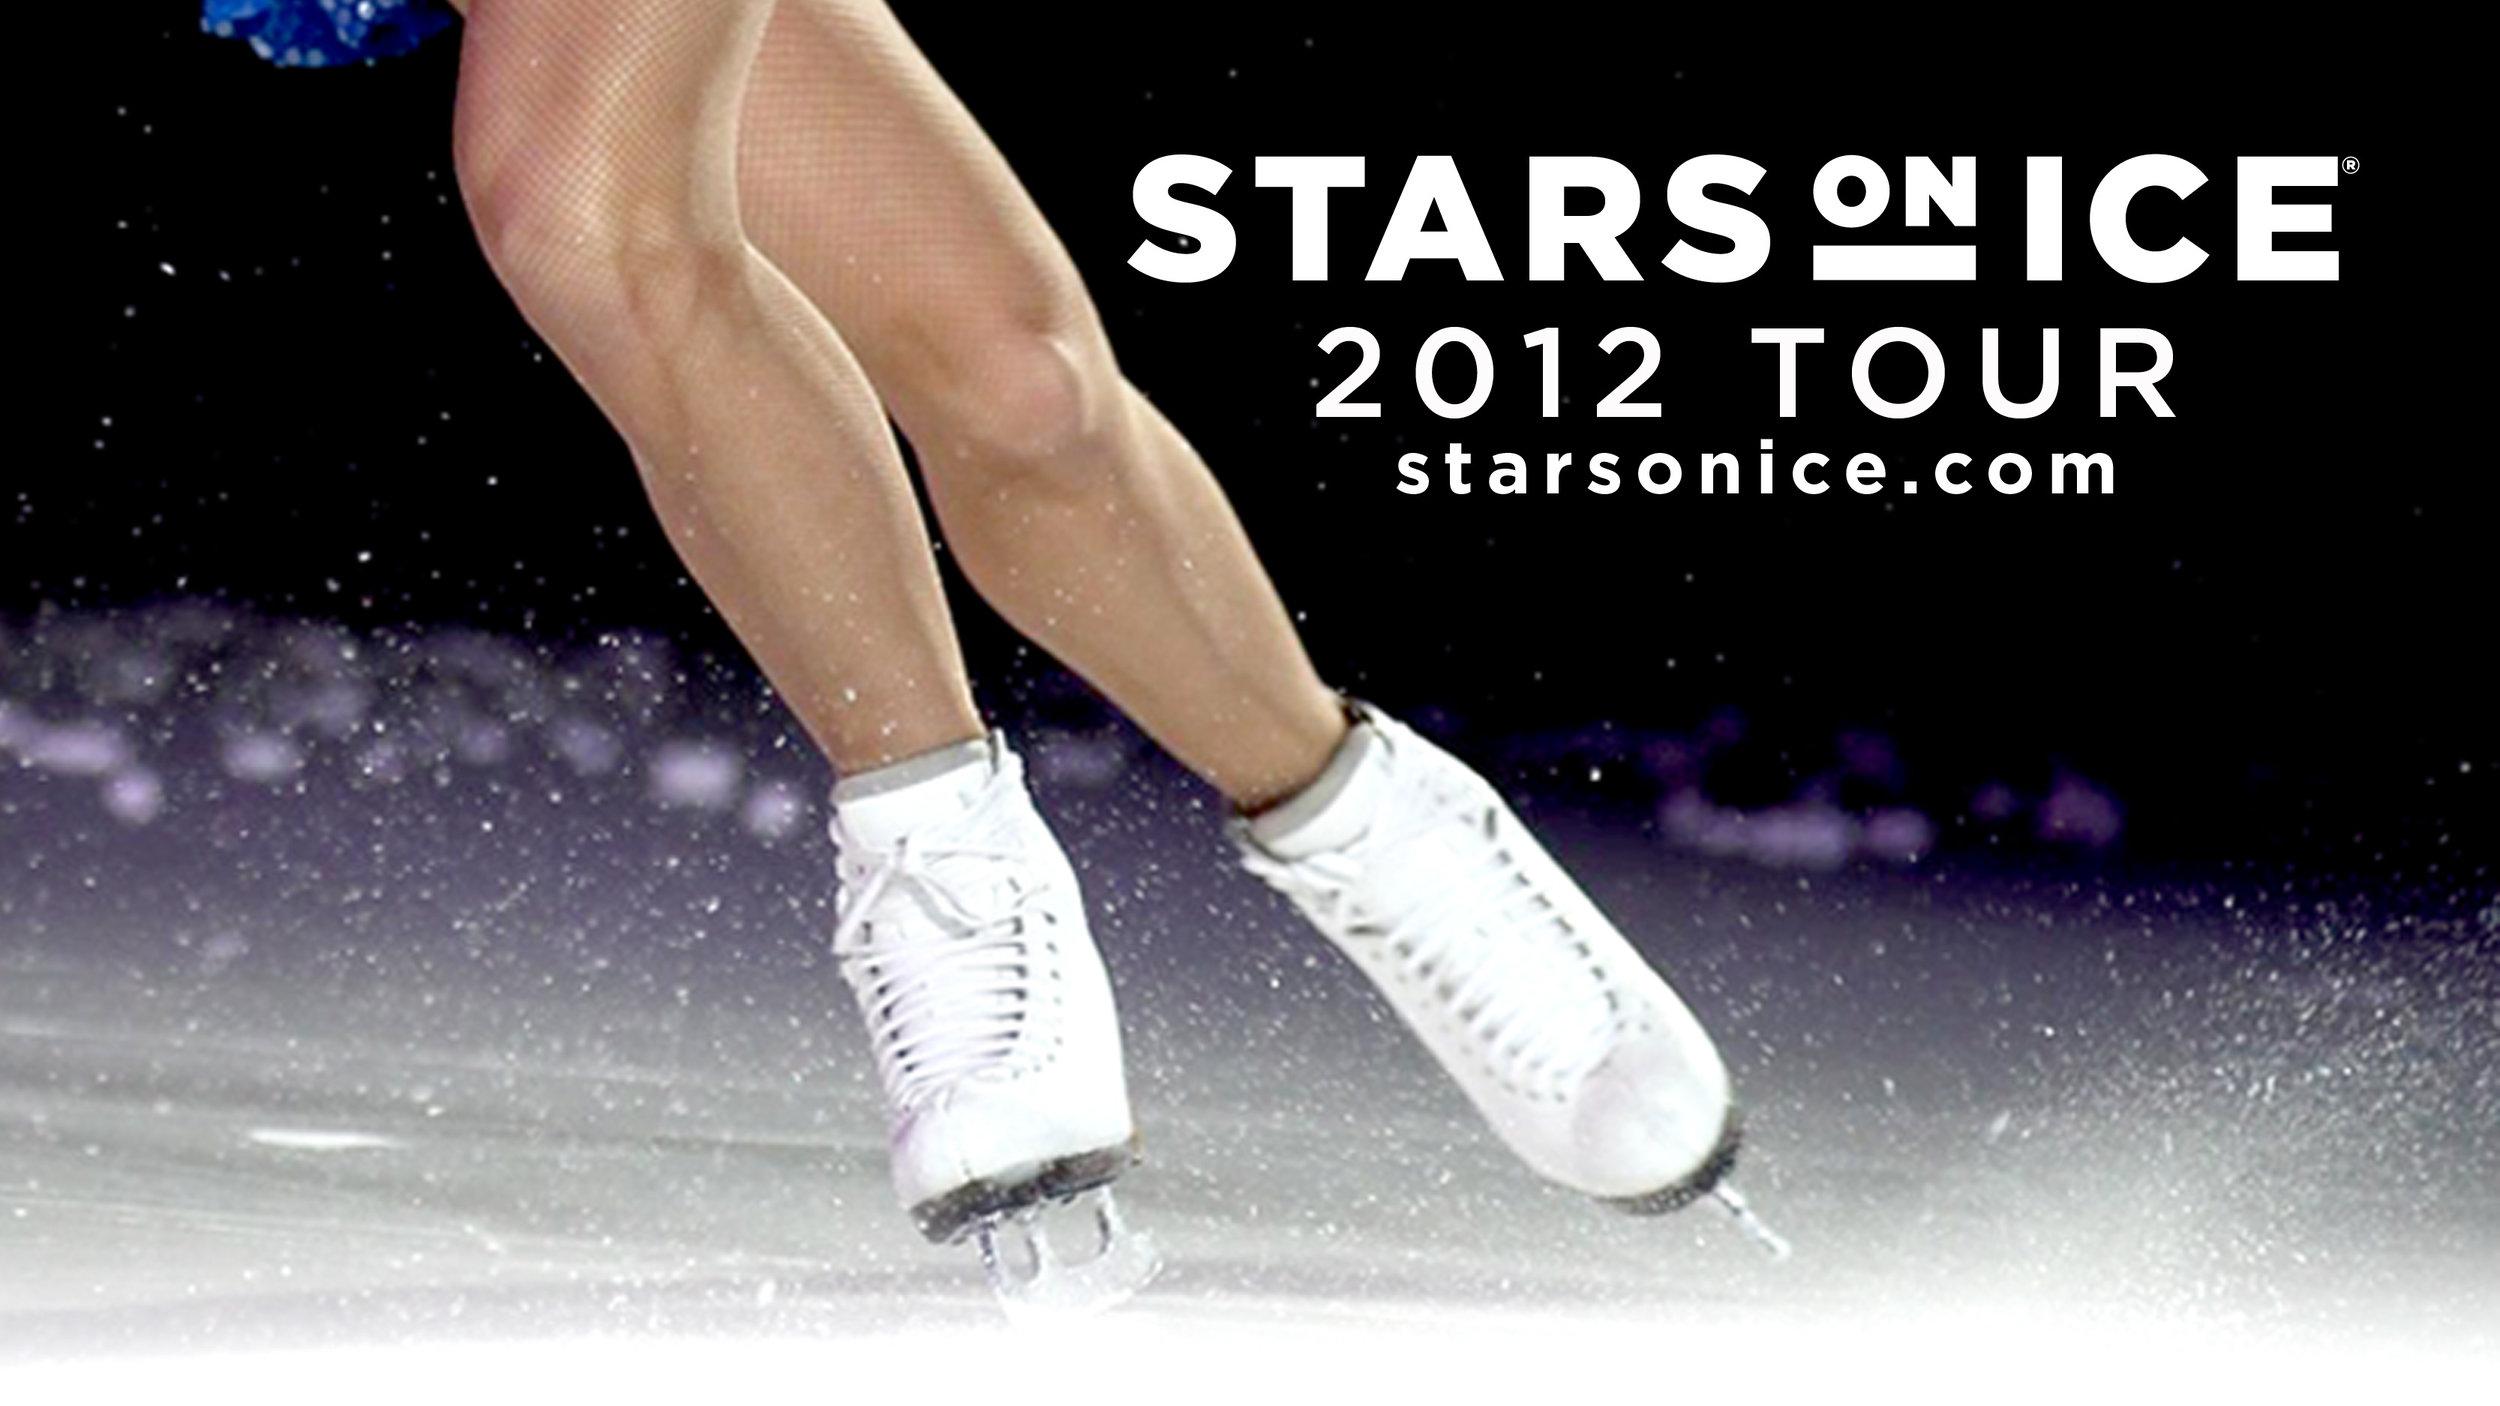 StarsOnIce_Horizontal_hi-res.jpg